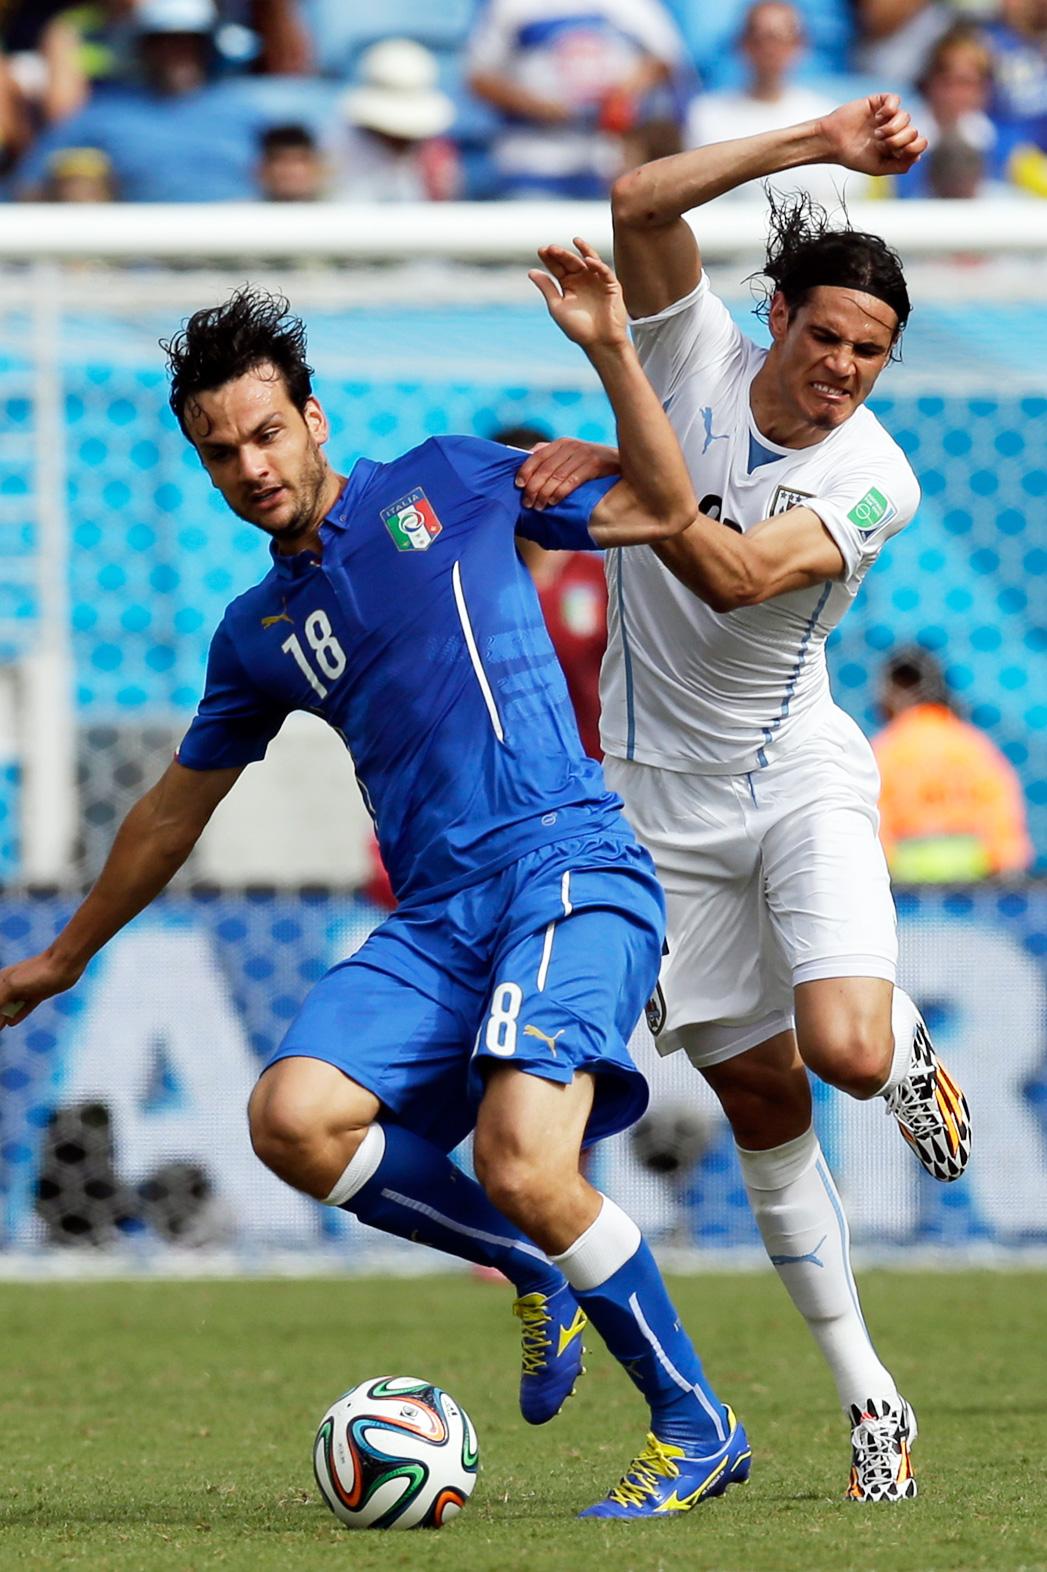 Sky Italia Mediaset Strike Deal To Broadcast Serie A Soccer In 2015 Hollywood Reporter